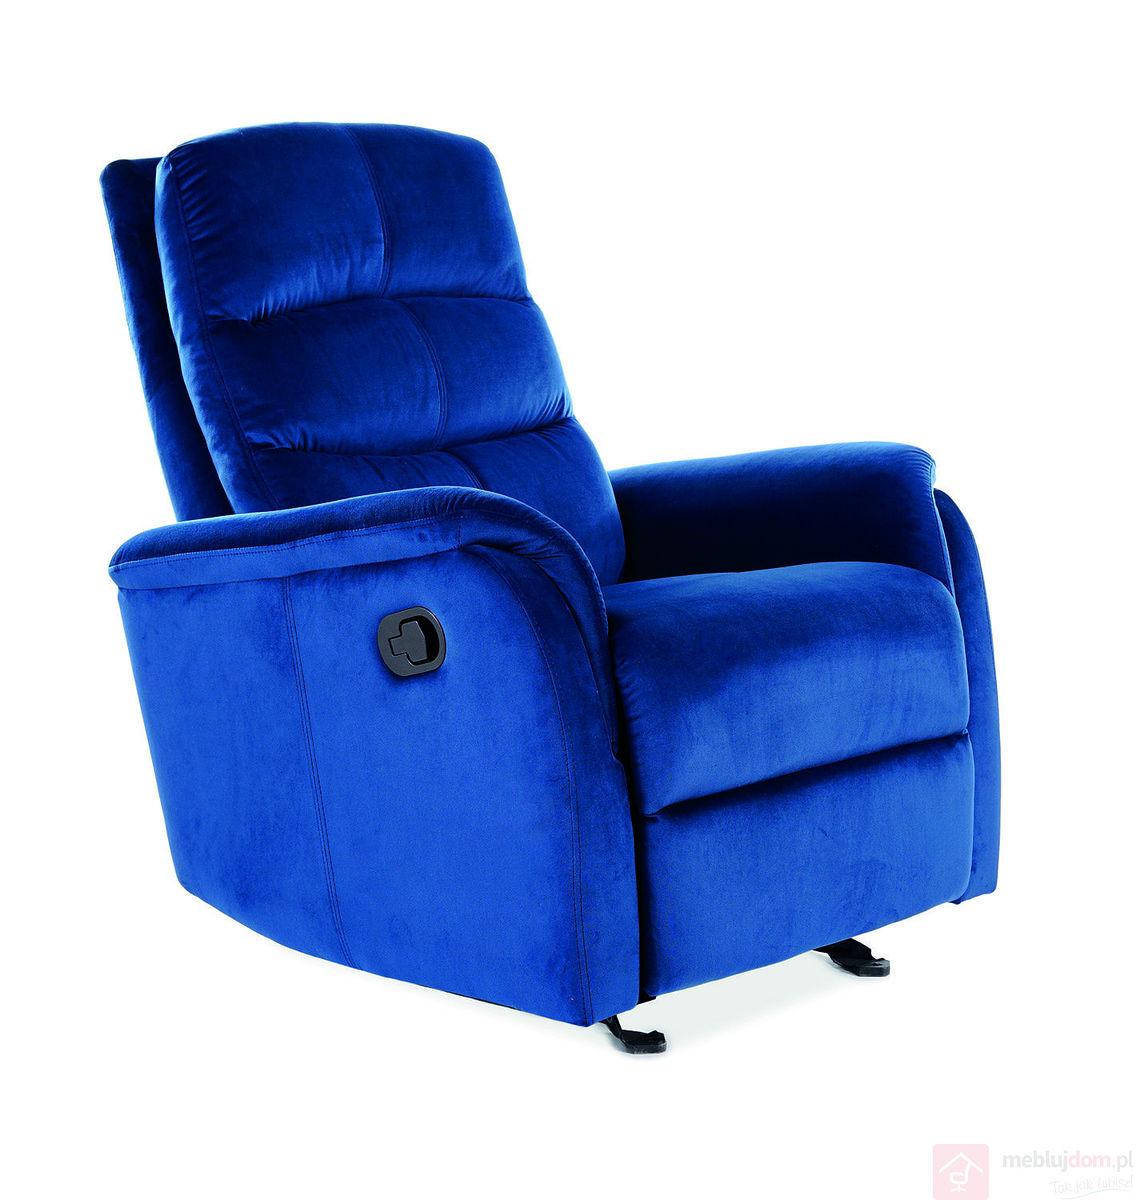 Fotel relaksacyjny JOWISZ VELVET Signal